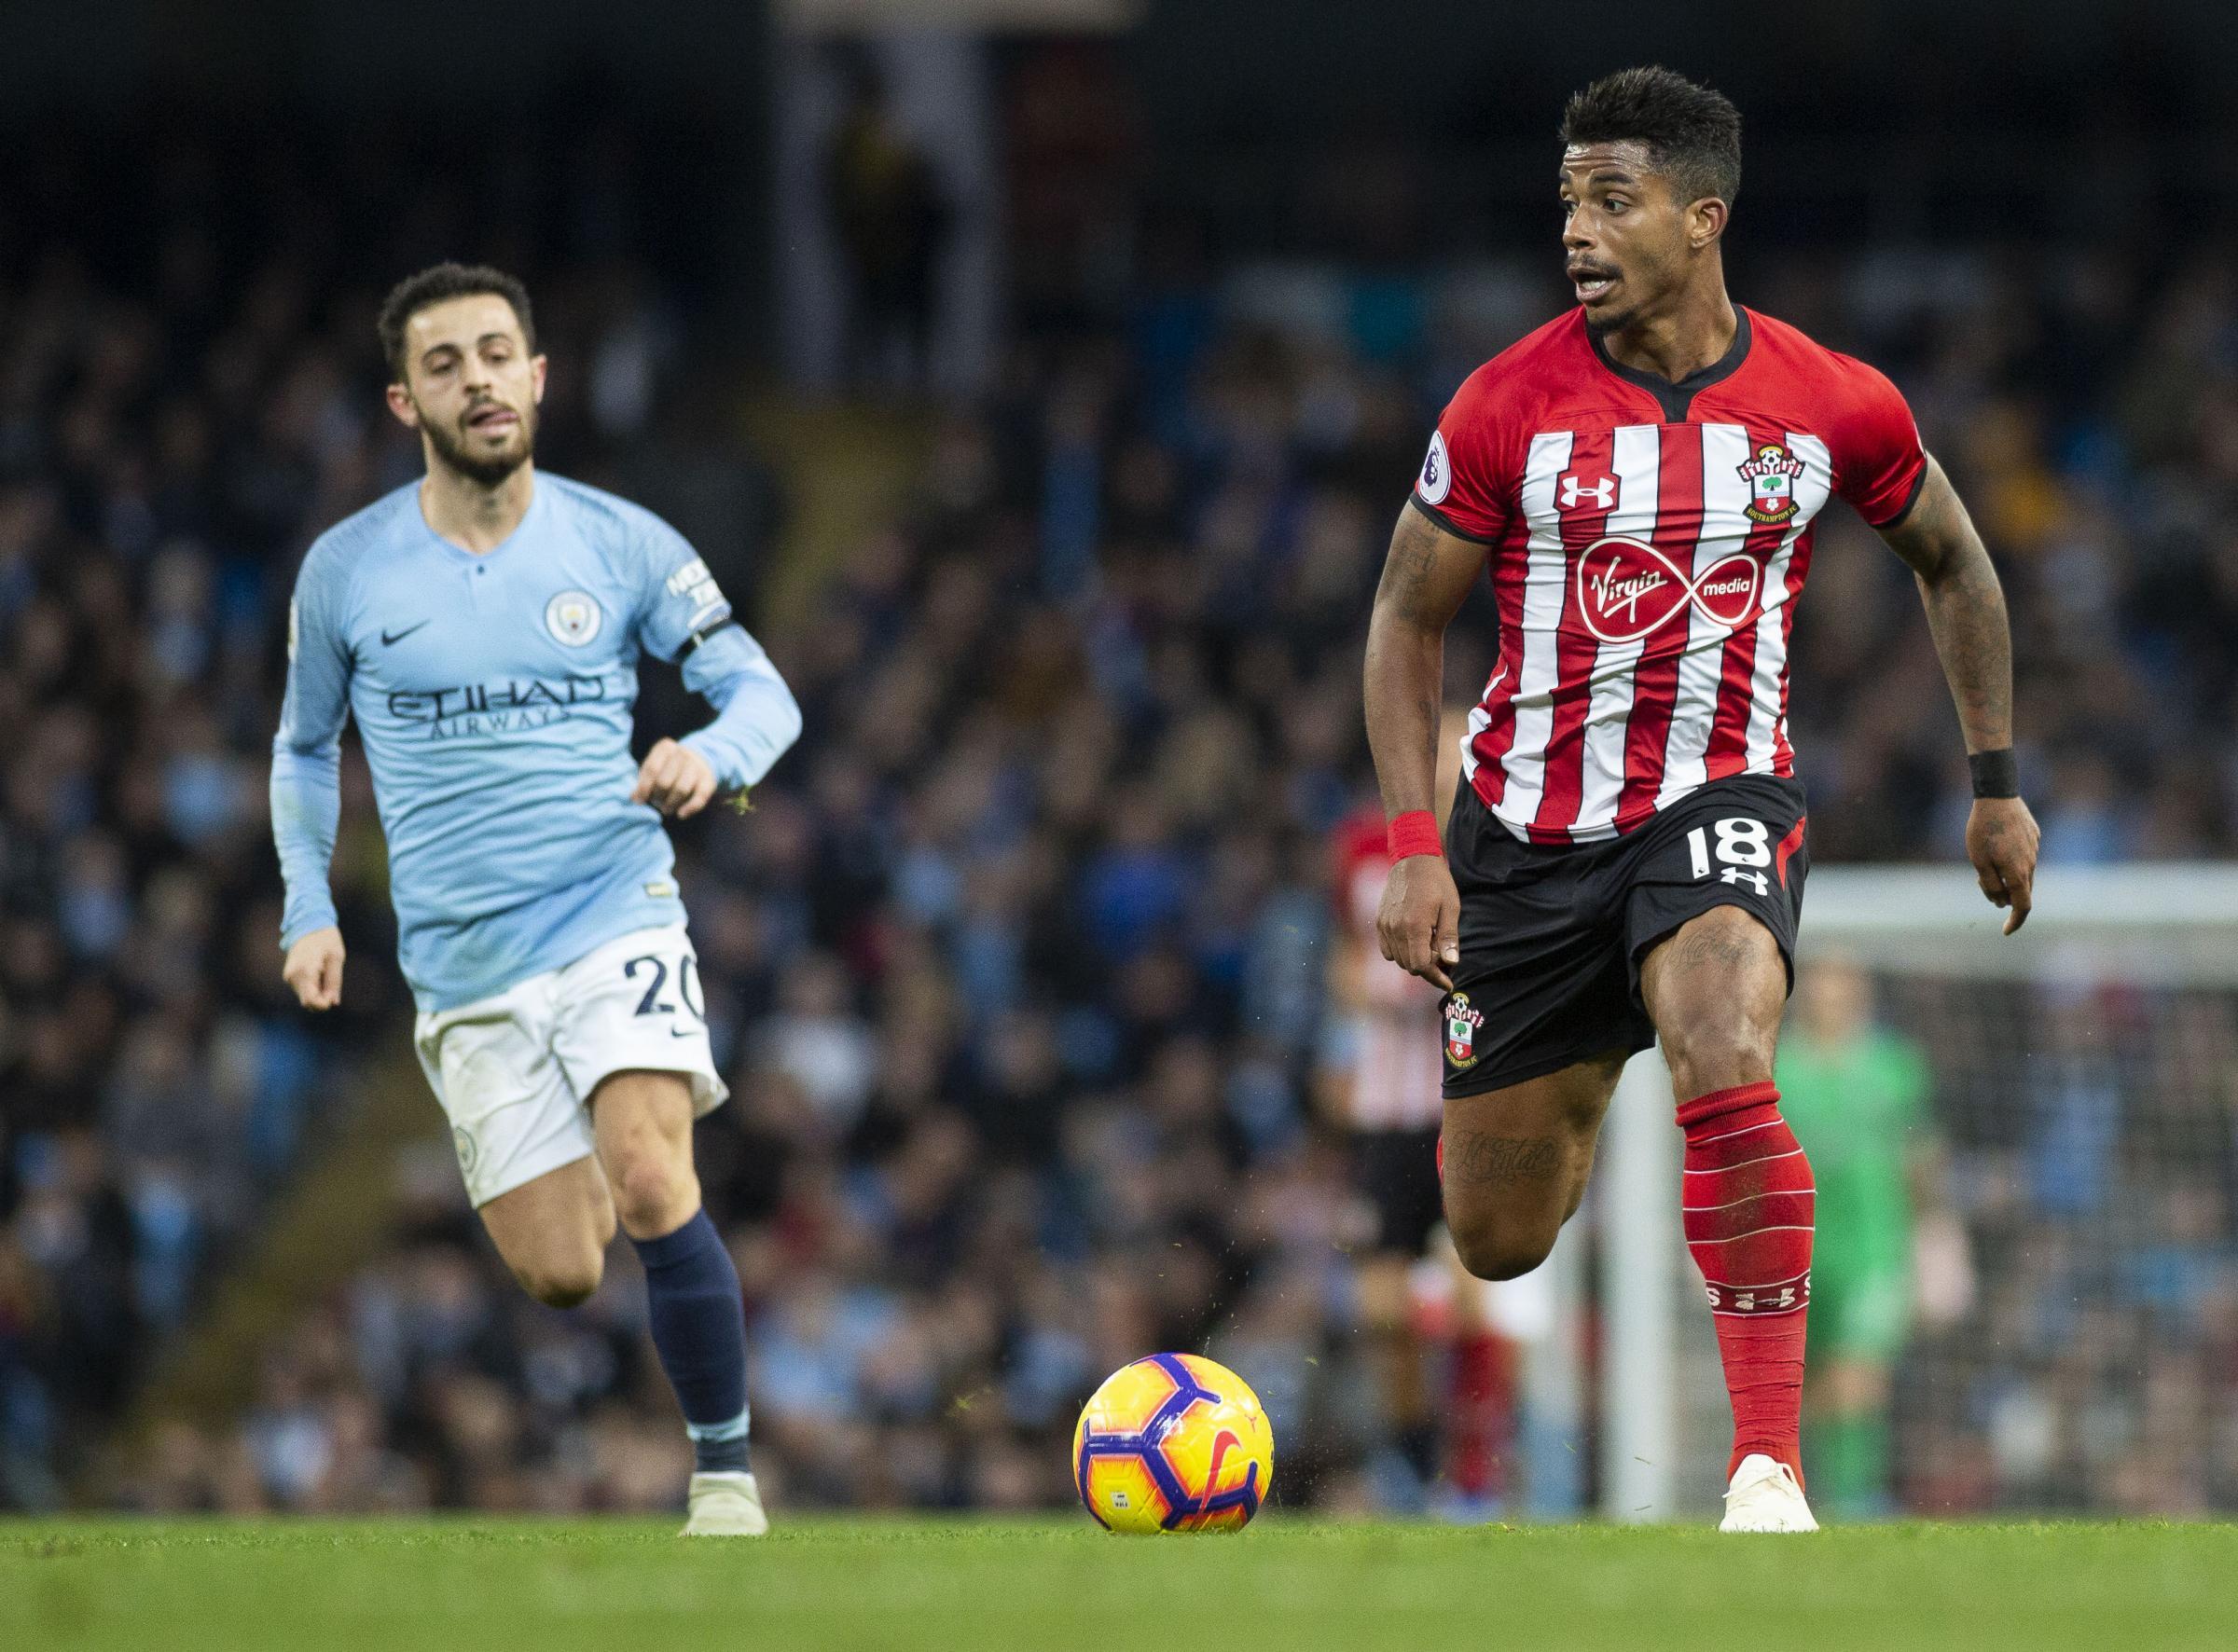 Southampton midfielder Mario Lemina is wanted by Monaco